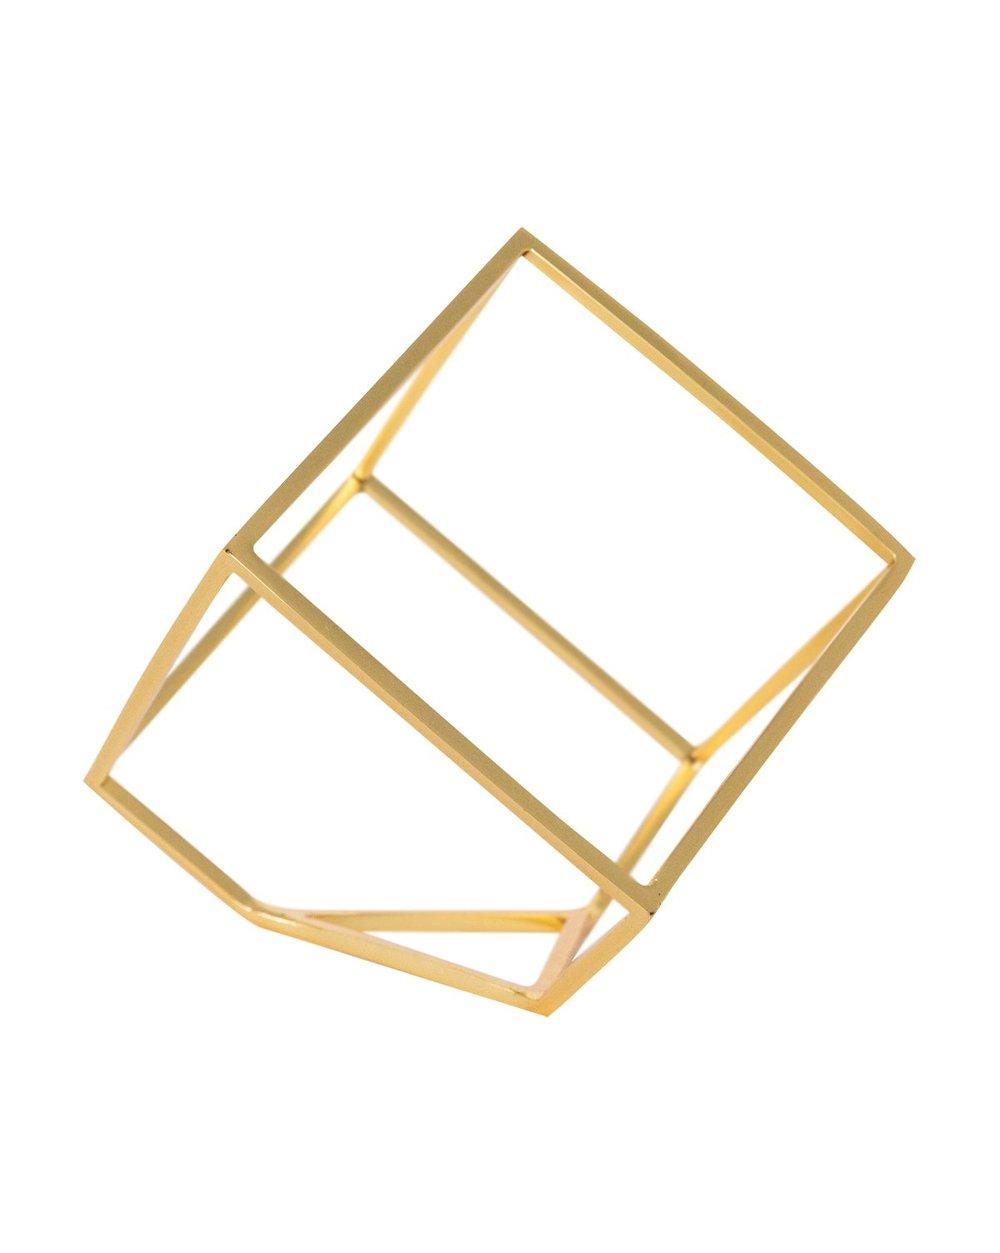 open_cube_object_-_gold_0d9ffbe3-29b6-4dd0-8d15-5a1ac0183145.jpg